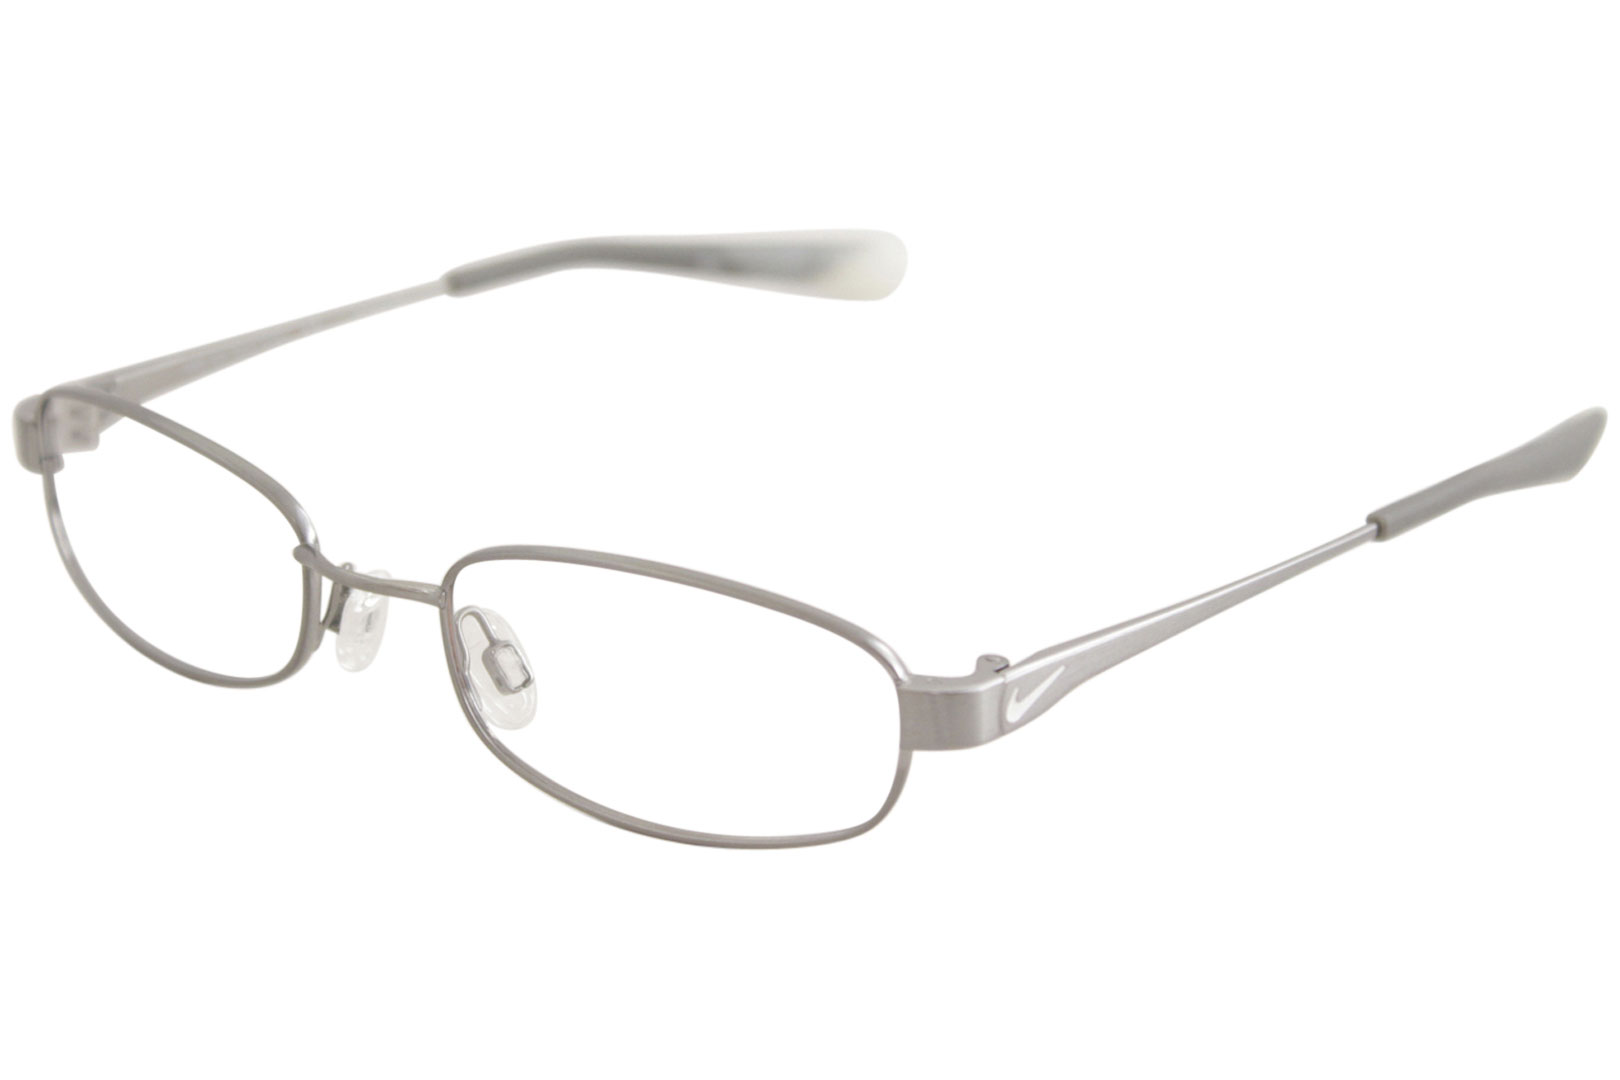 4cf5cfefd97b Nike Youth Boy s Eyeglasses 4638 033 Gunmetal White Flexon Optical ...